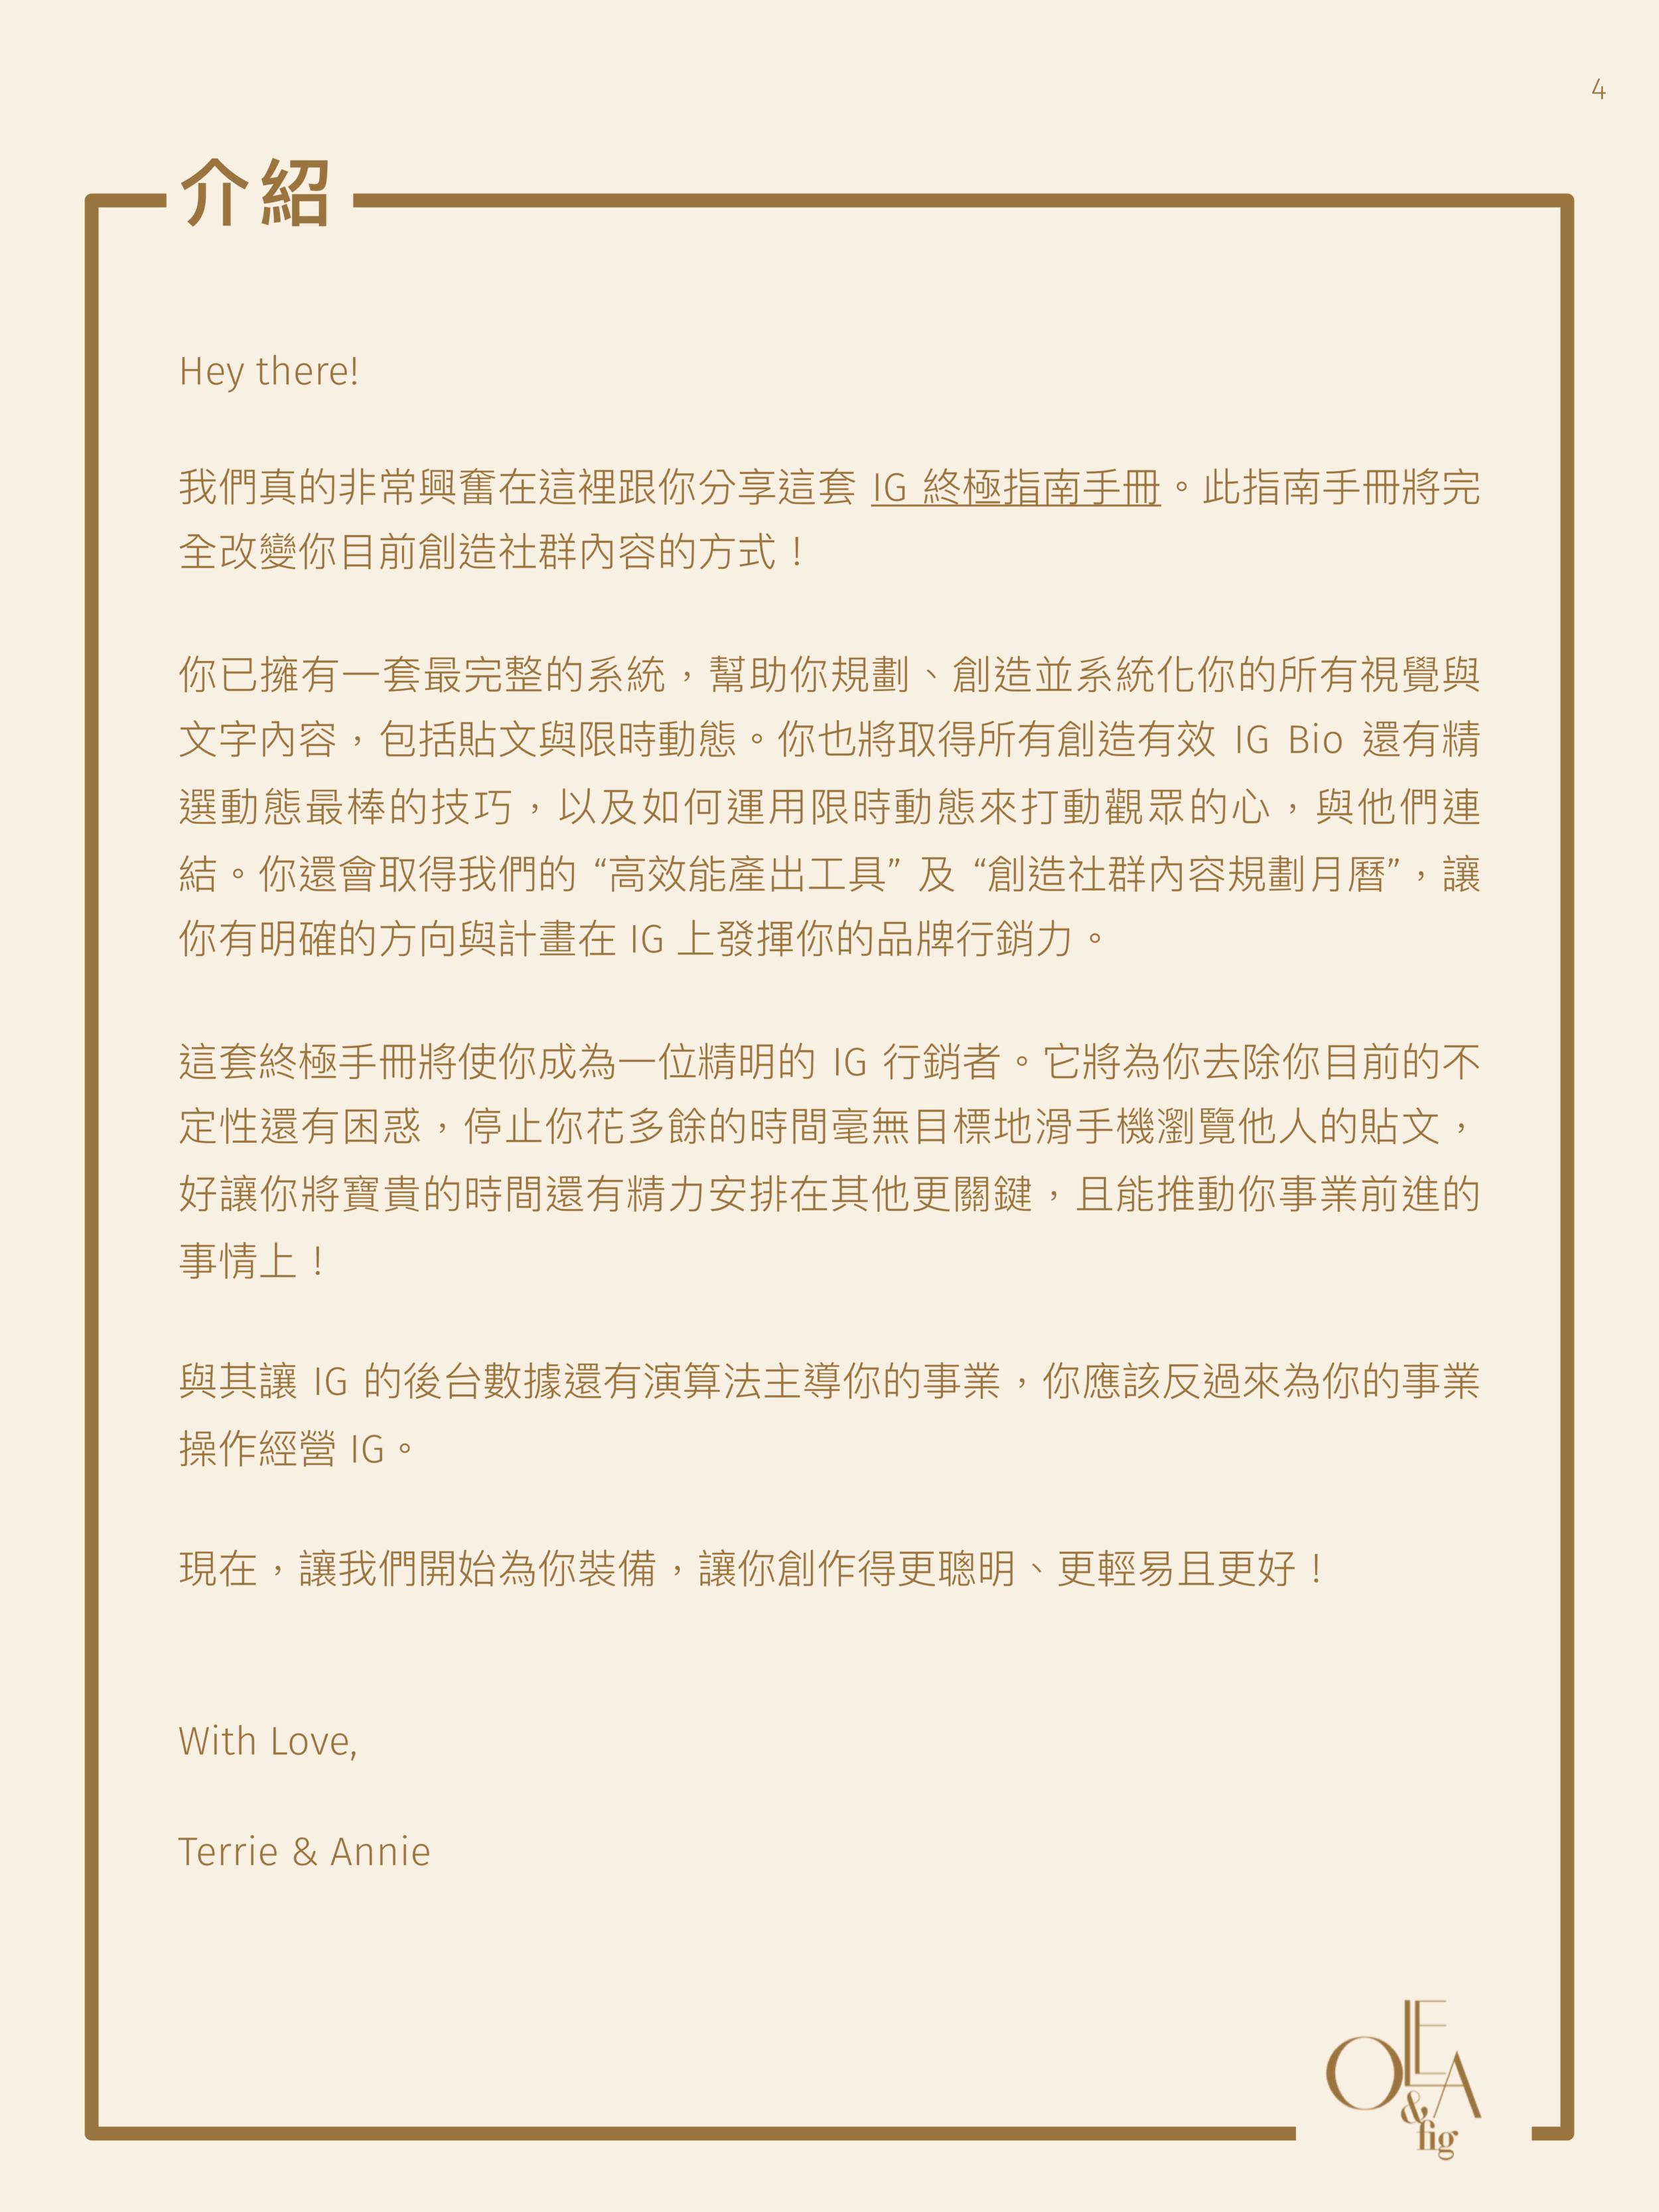 [Olea & FIg] IG終極指南手冊 copy 3.png